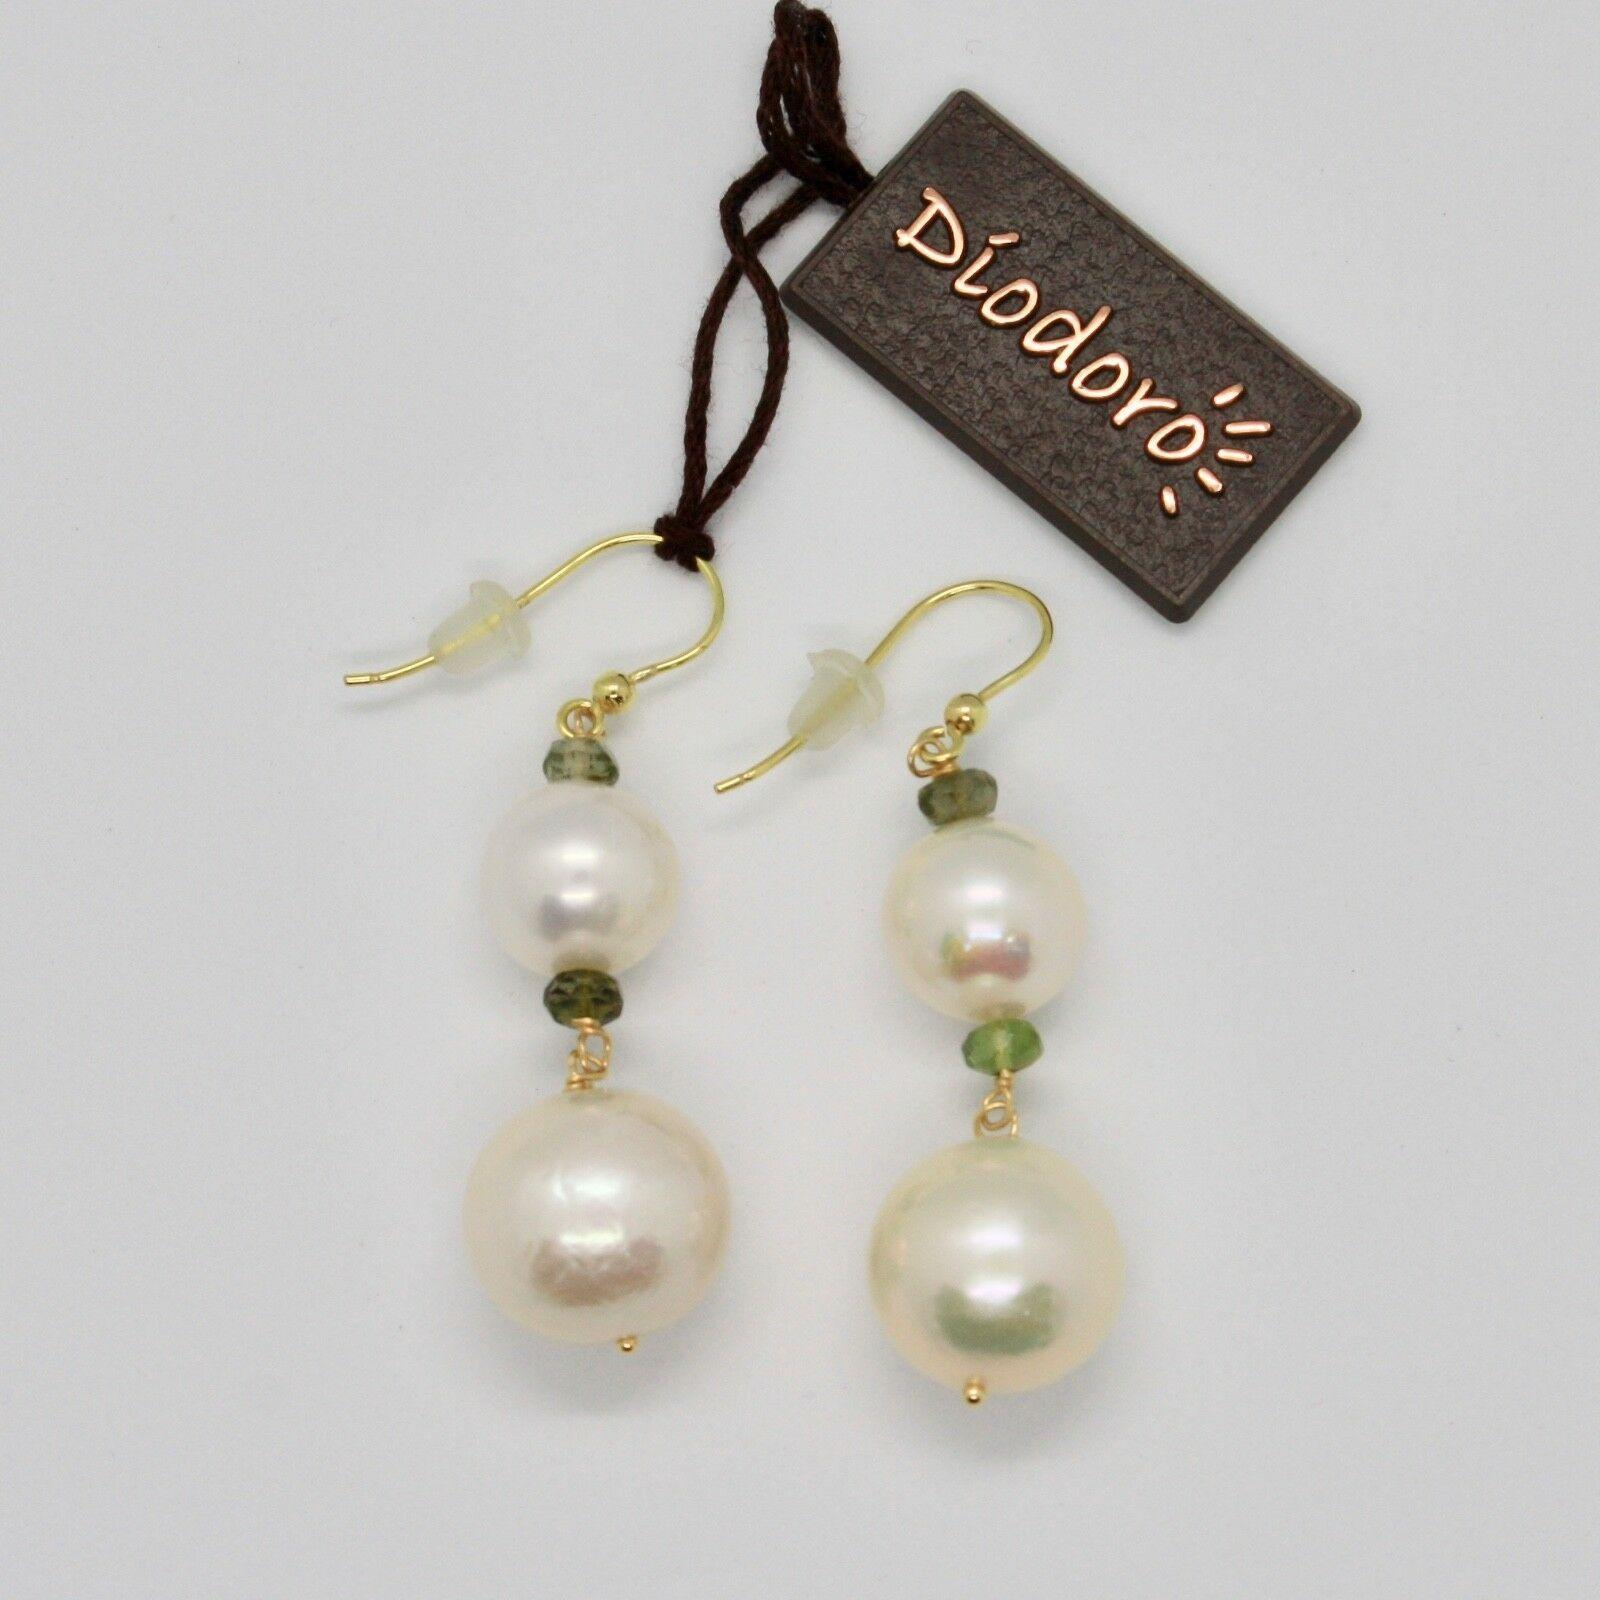 Boucles D'Oreilles en or Jaune 18k 750 Perles Eau Douce Tourmalines Vert